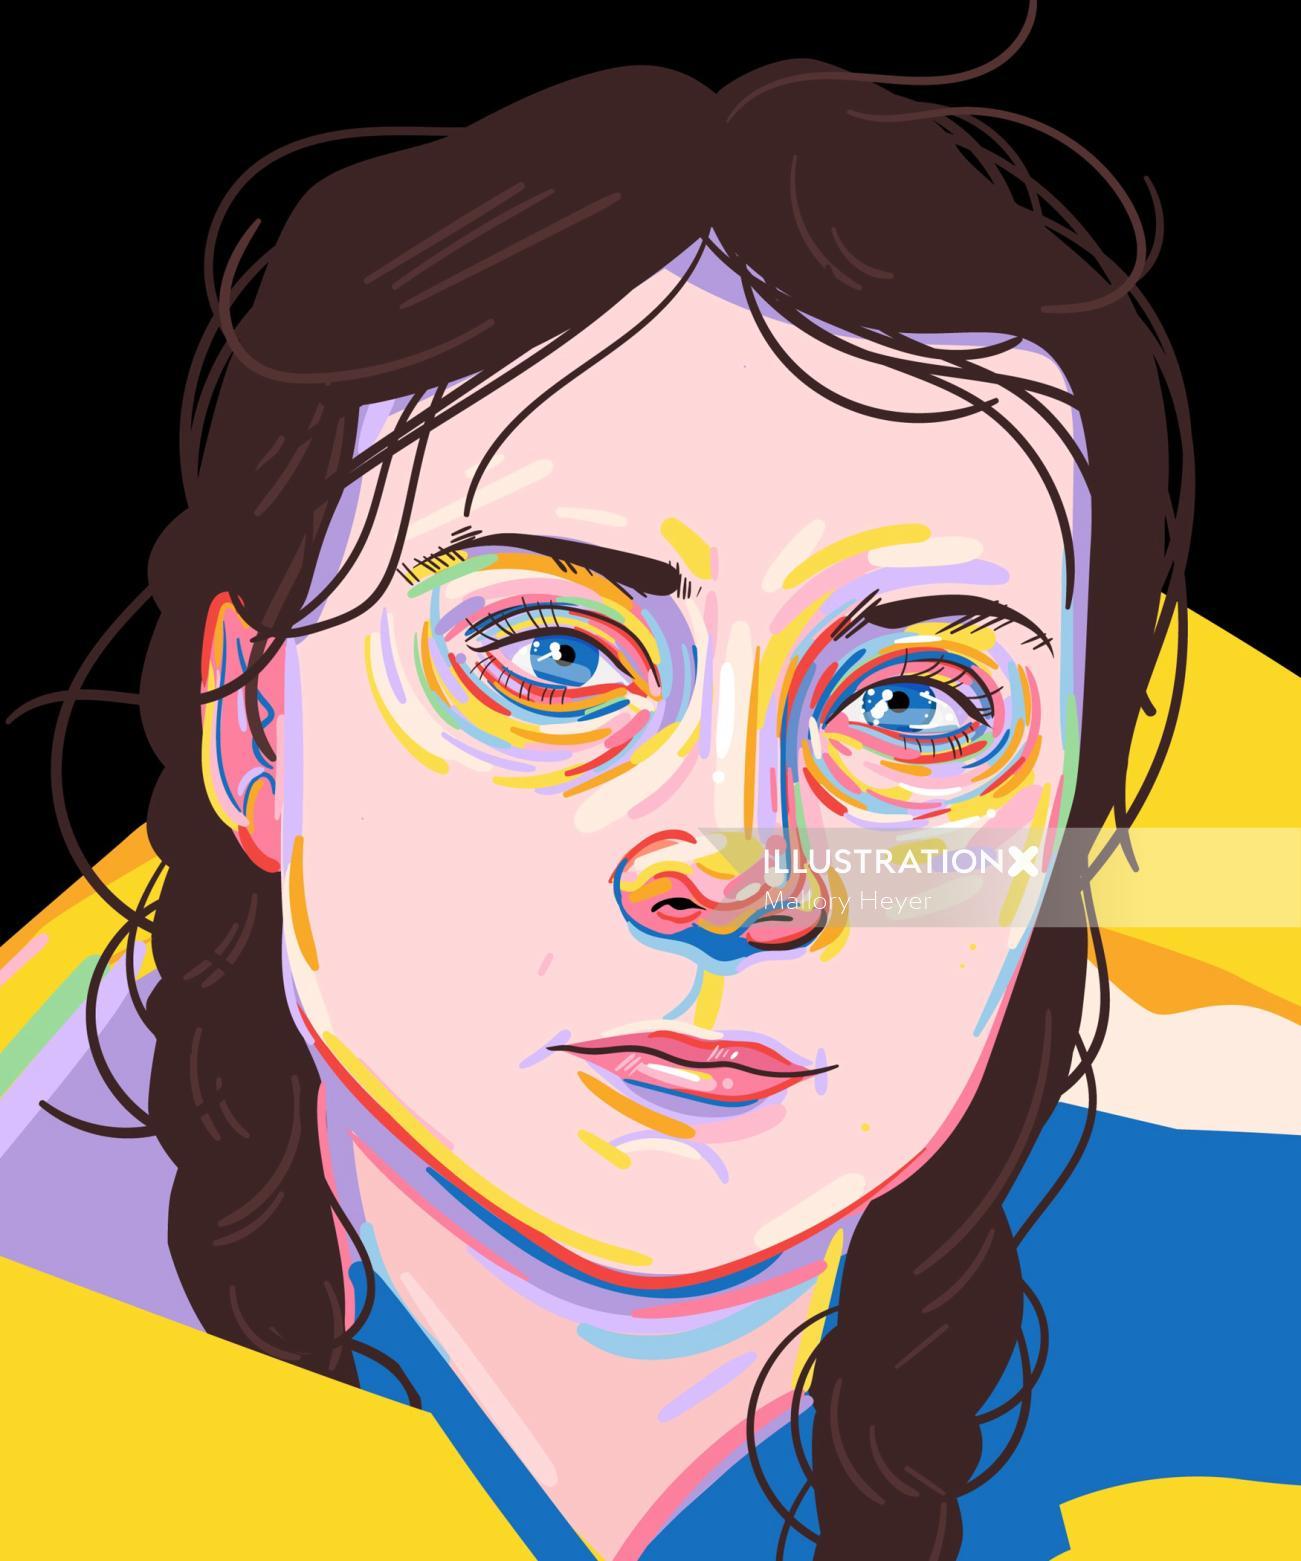 Greta Thunberg portrait illustration